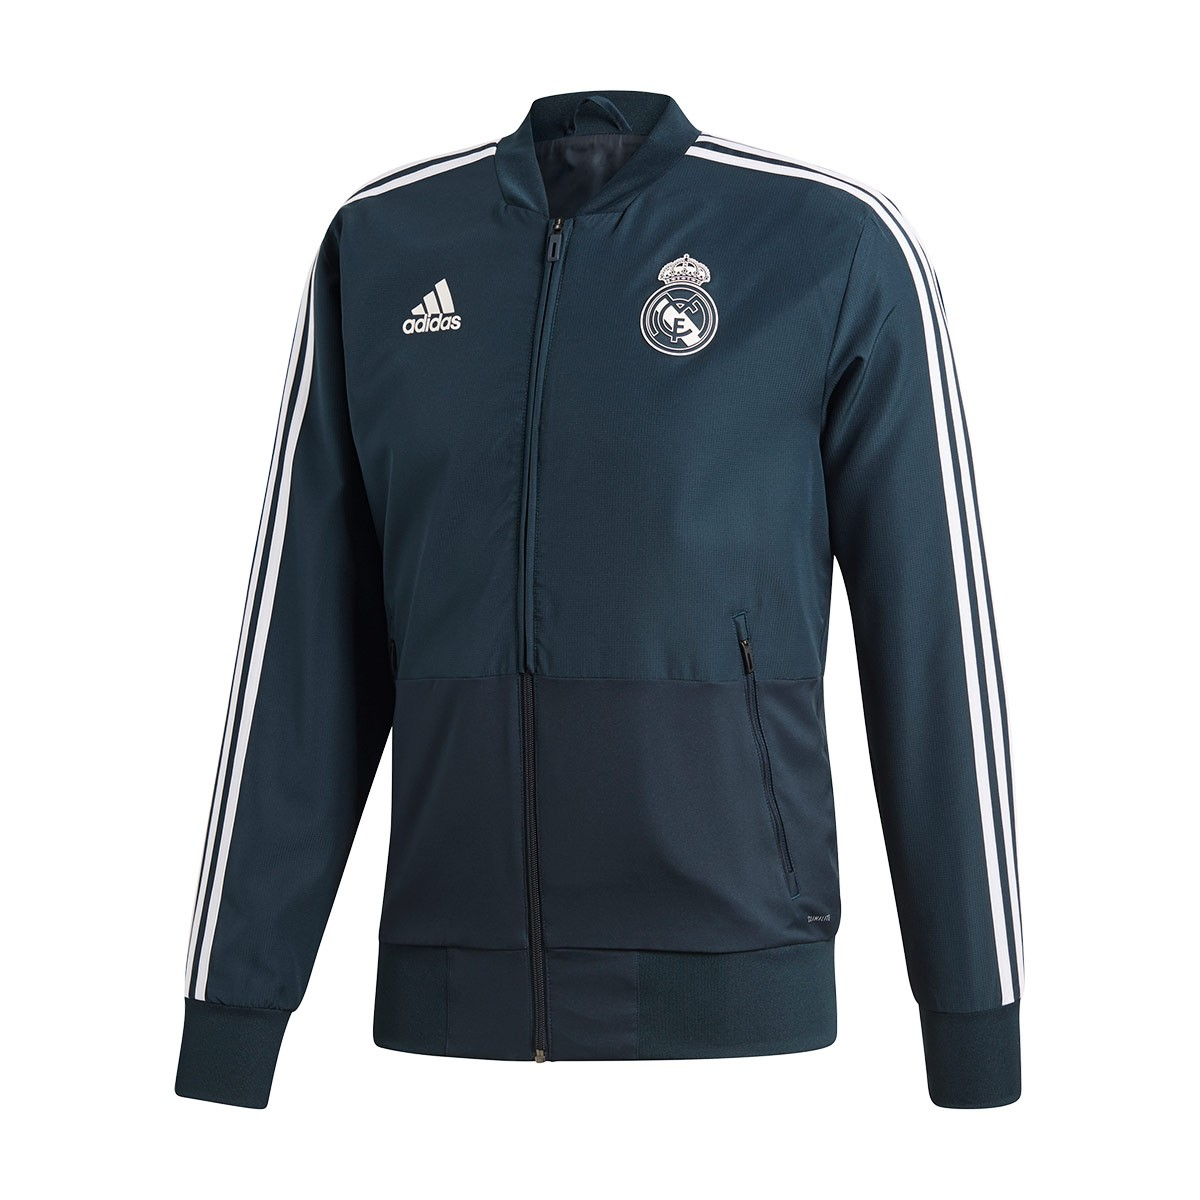 44bb59af6 adidas Real Madrid Prematch 2018-2019 Jacket. Tech onix-Black-White ...